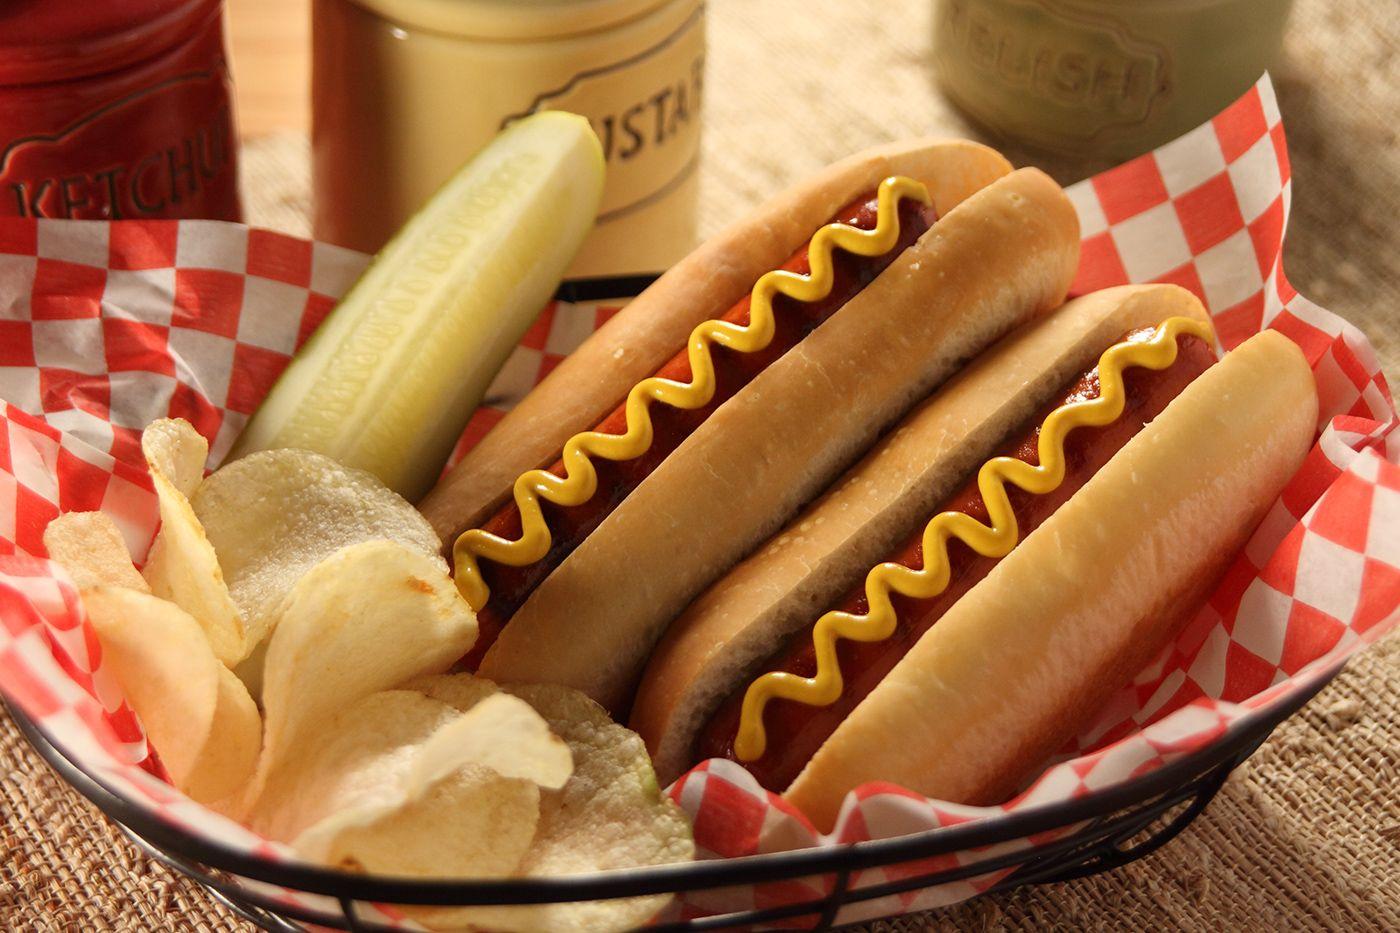 Hot dog buns rhodes bakenserv hot dog buns hot dog